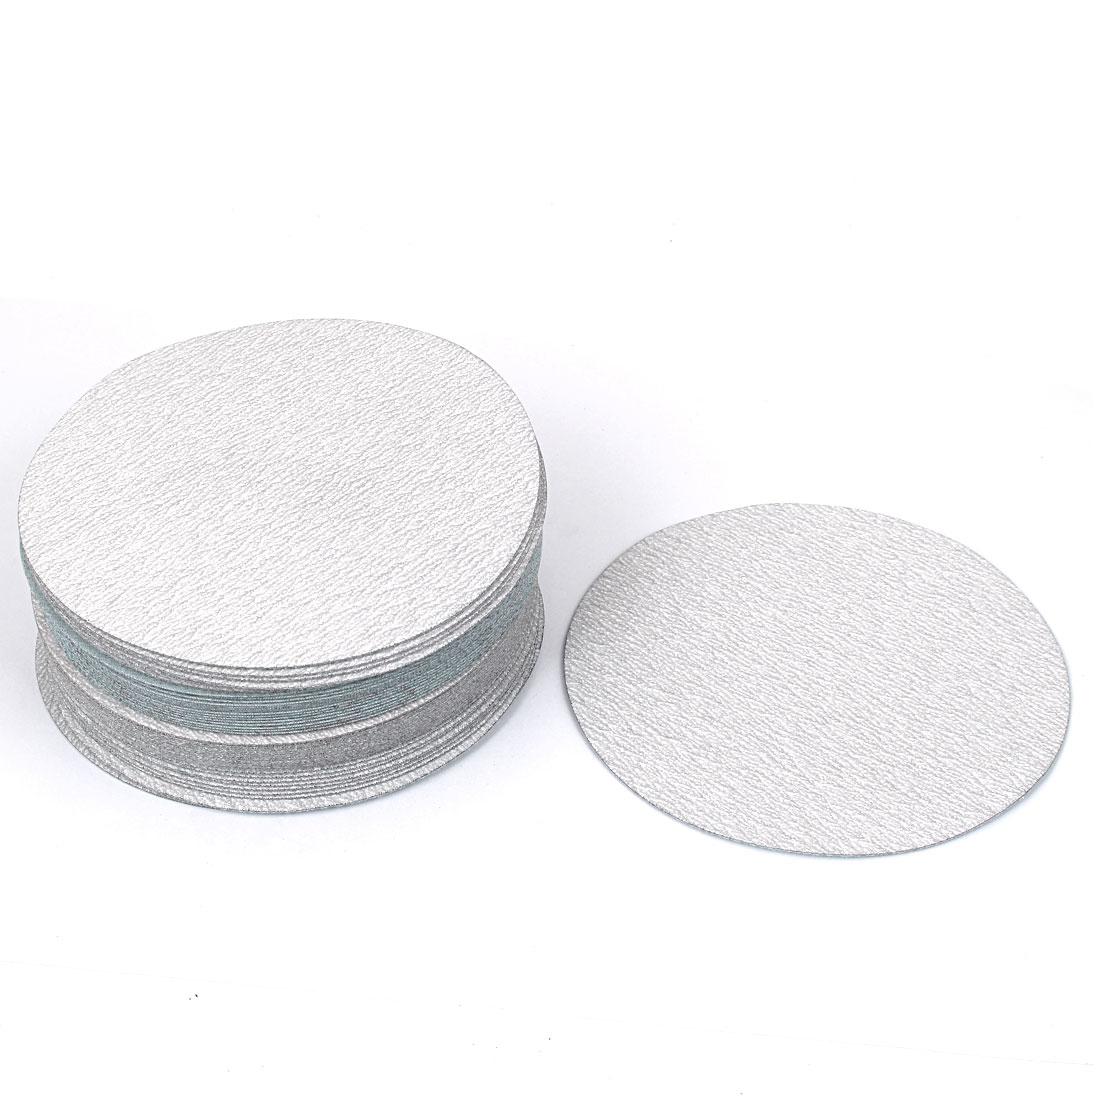 "6"" Dia Polishing Round Dry Abrasive Sanding Sandpaper Sheet Disc 320 Grit 50pcs"